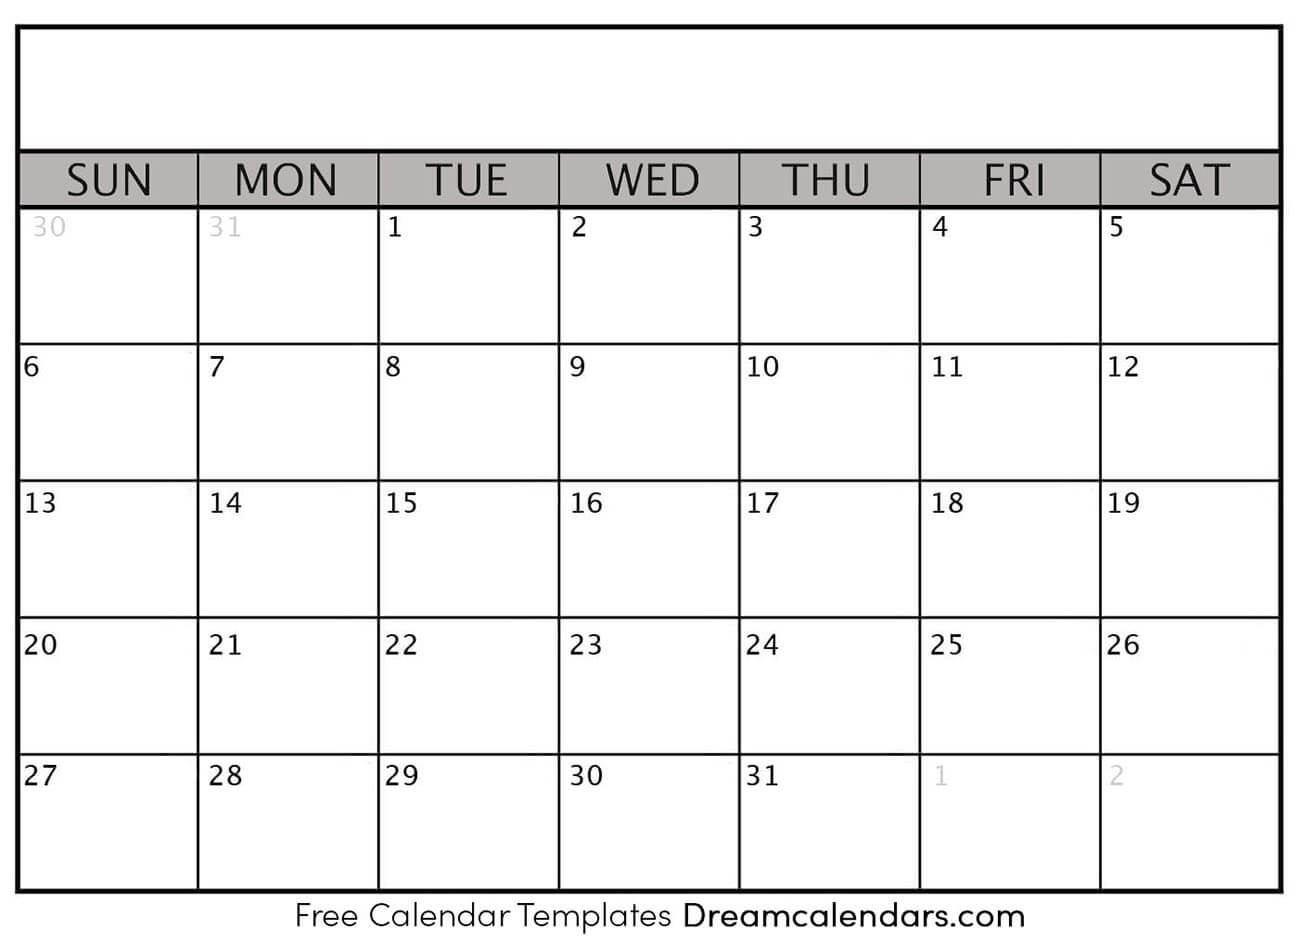 Printable Blank Calendar 2020 | Dream Calendars  Blank Calendar 2020